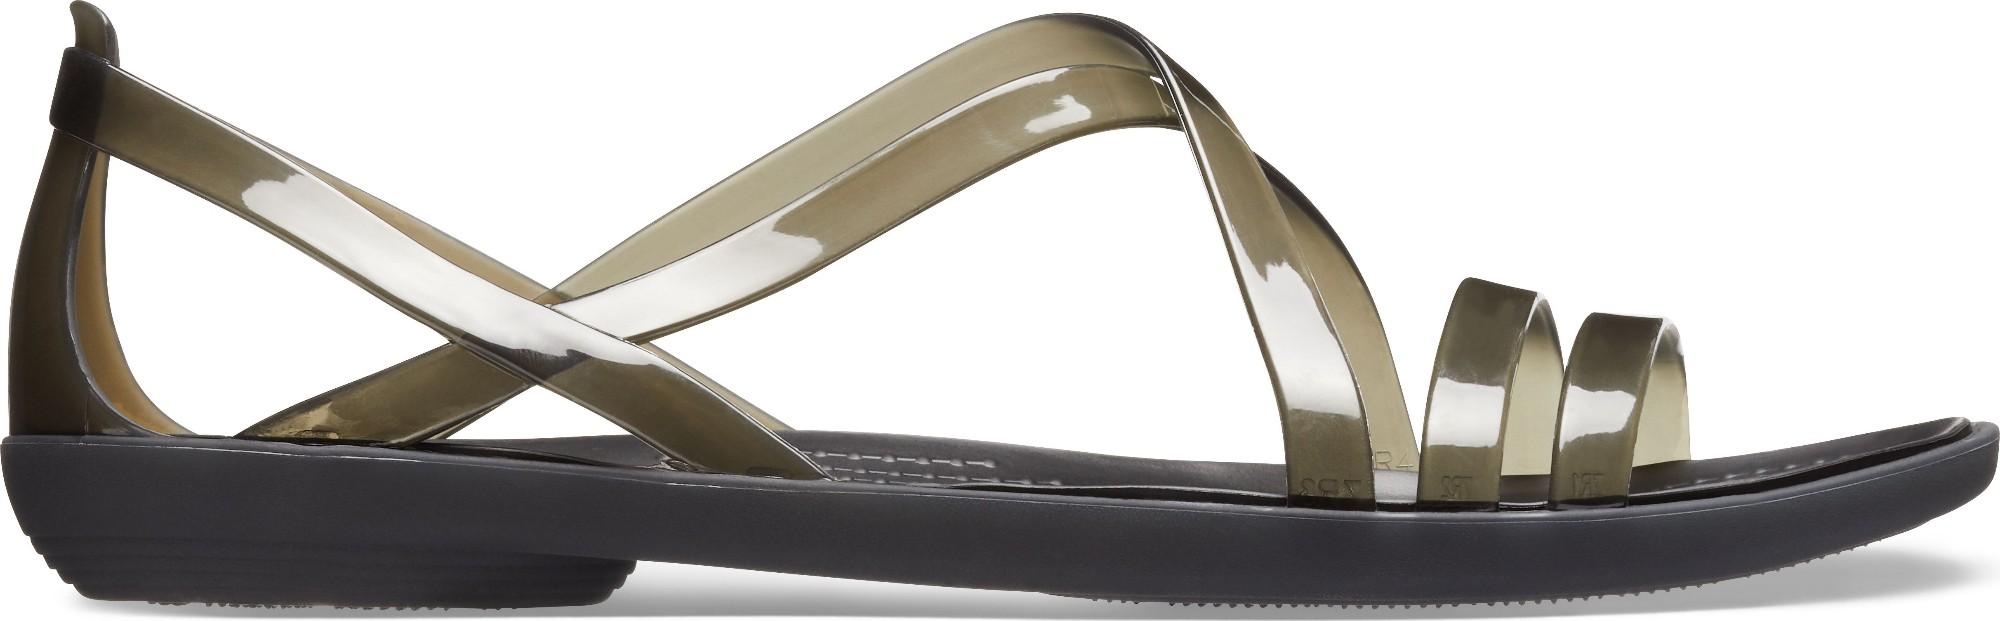 Crocs™ Isabella Strappy Sandal Black 38,5